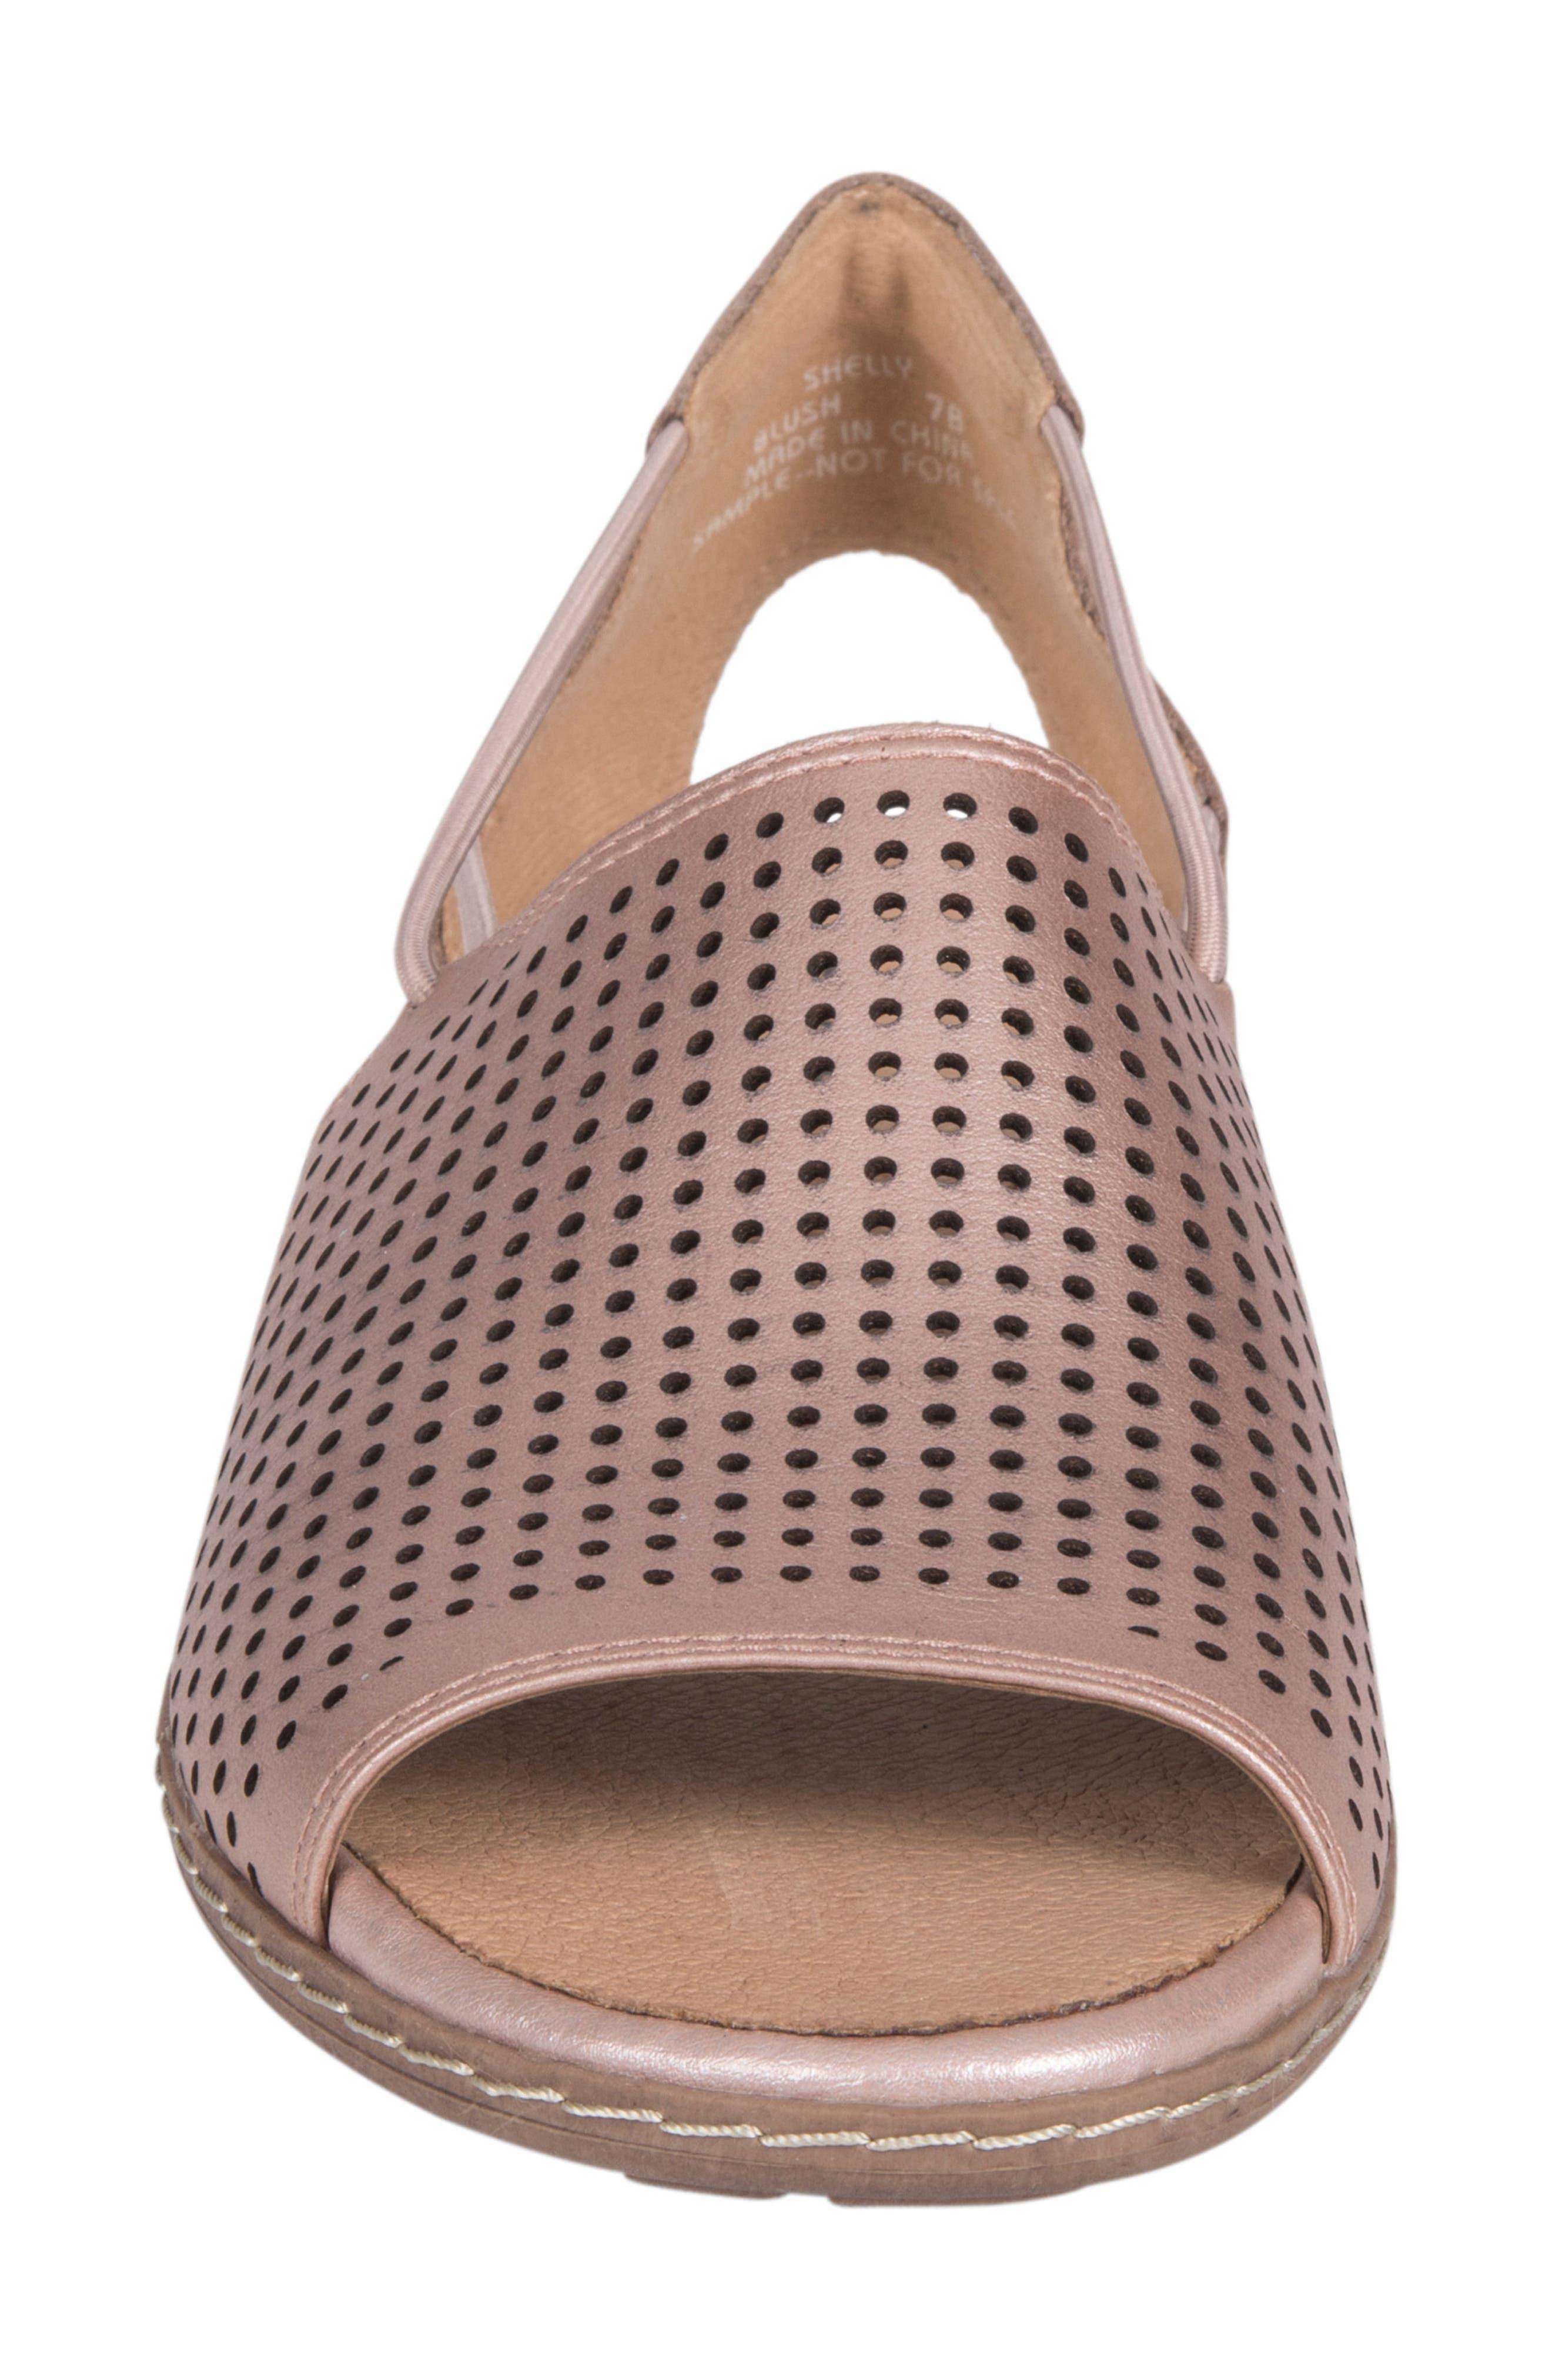 Shelly Sandal,                             Alternate thumbnail 4, color,                             Blush Metallic Leather